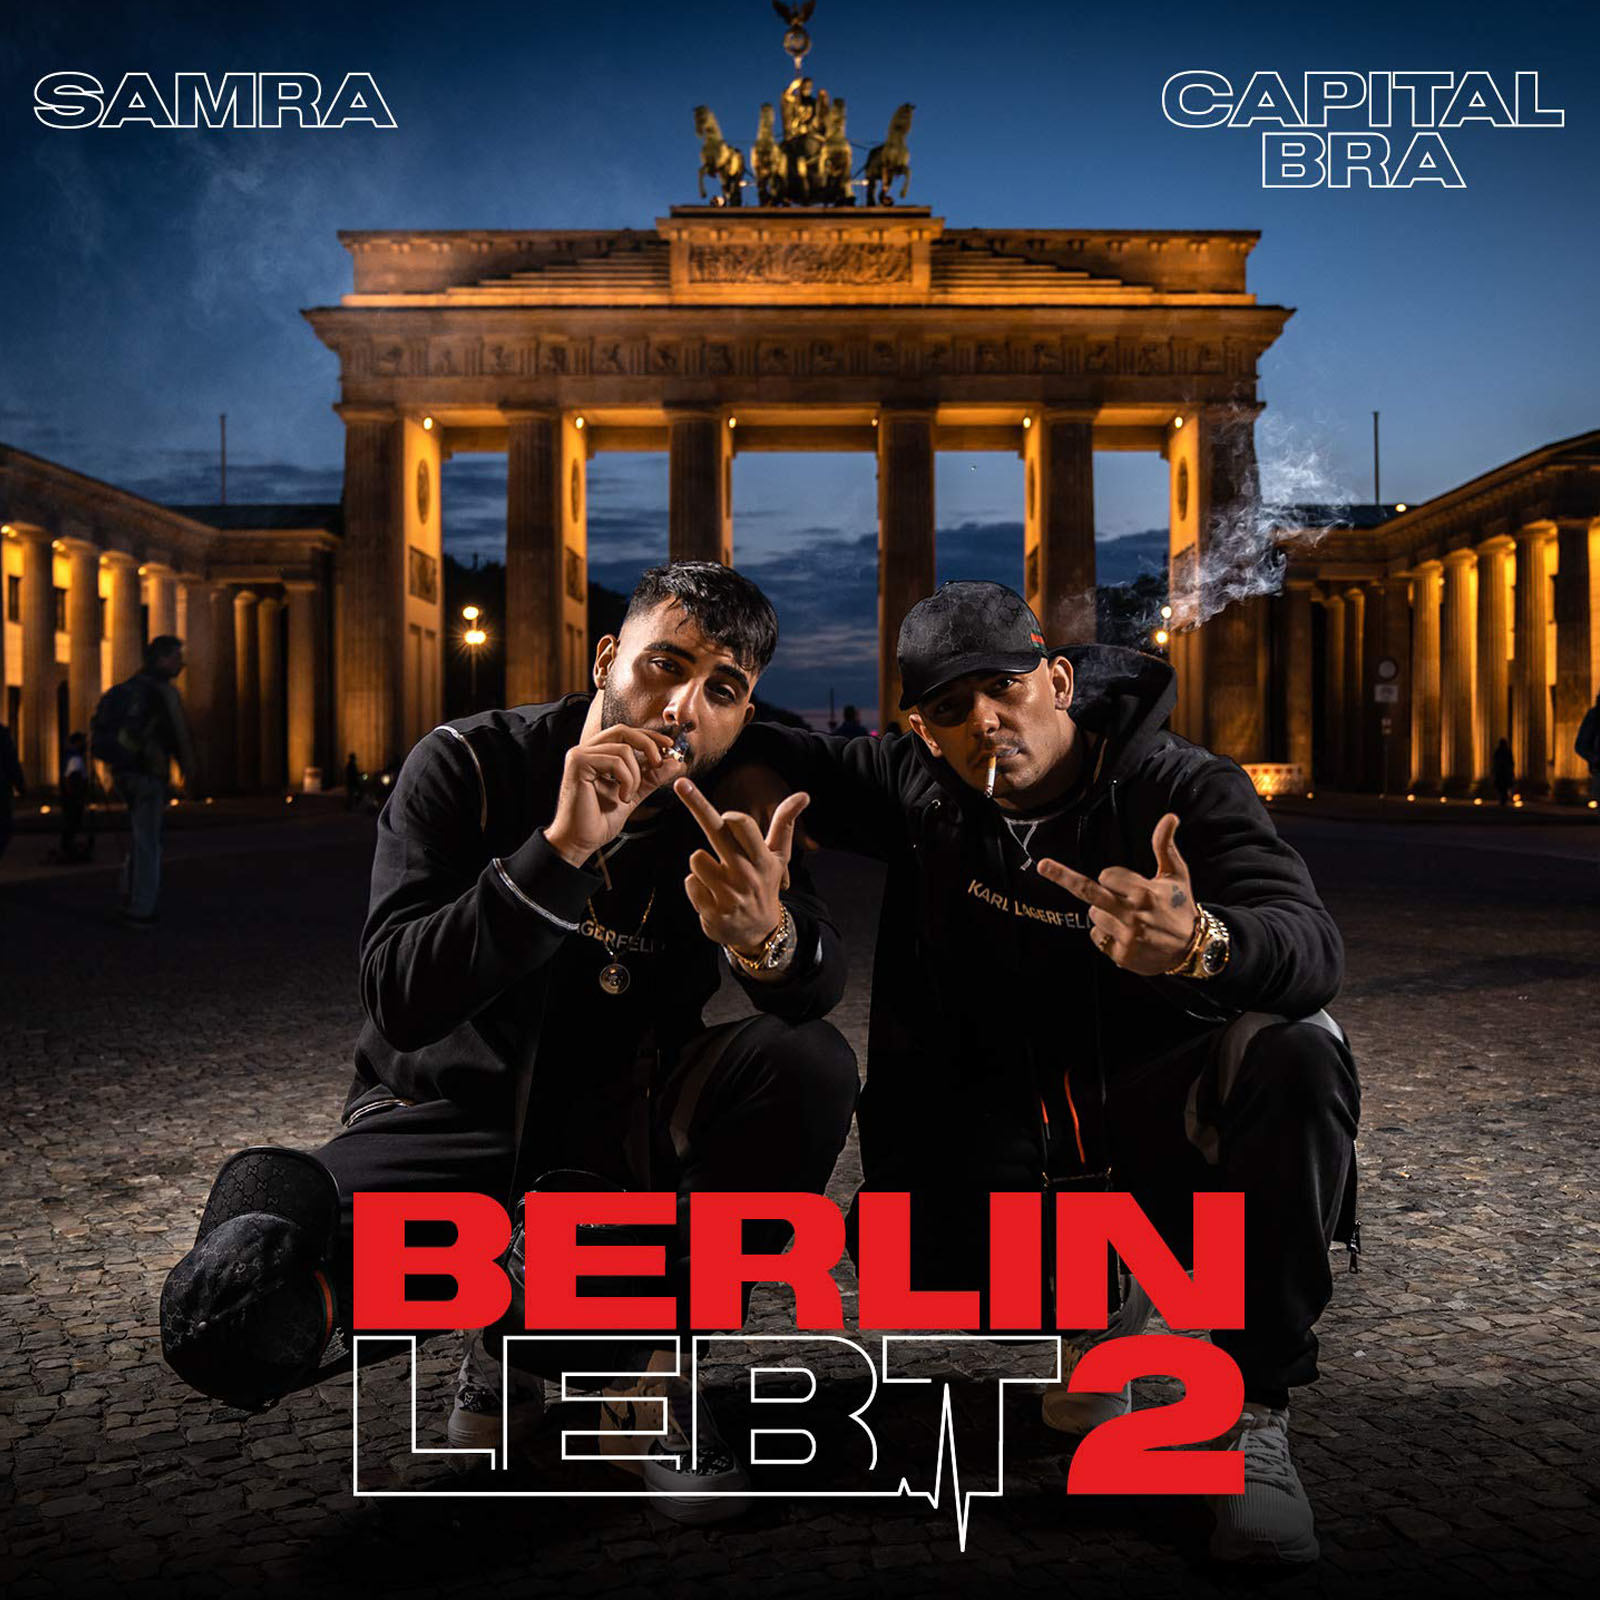 Capital Bra, Samra - Berlin Lebt 2 | Hiphop.de